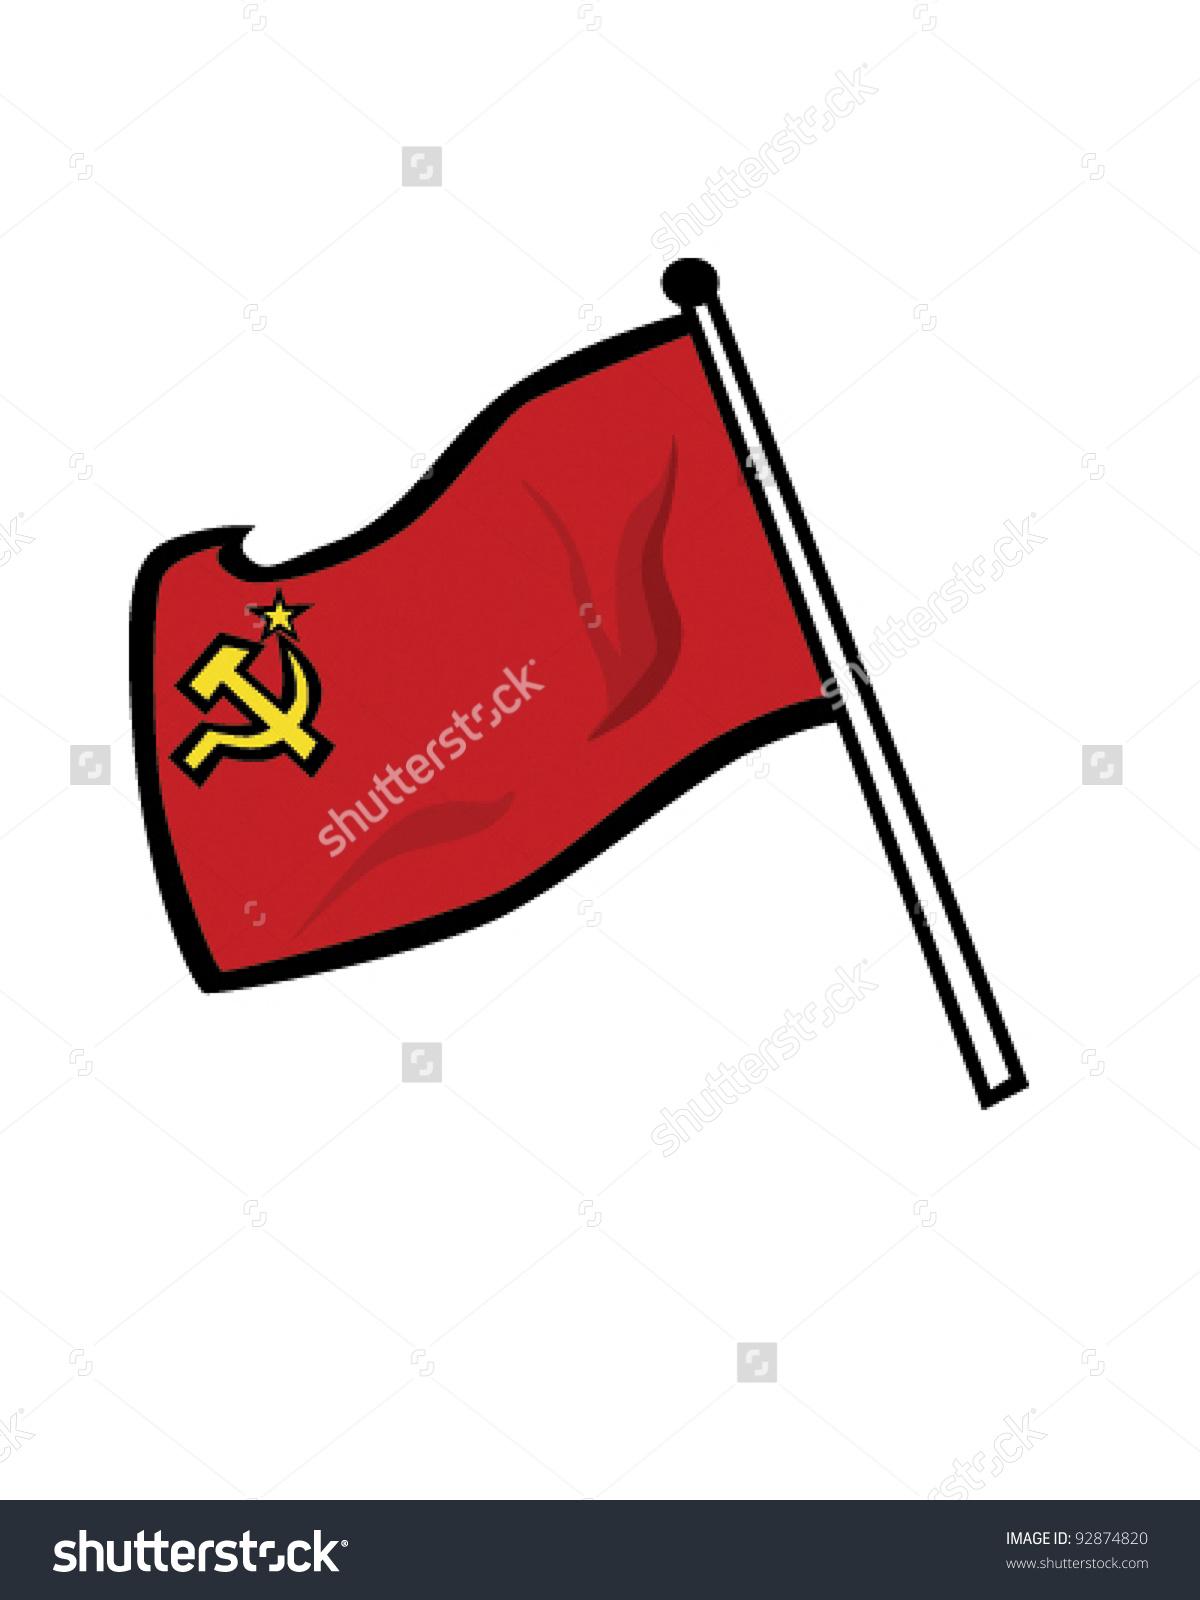 Soviet union flag clipart.